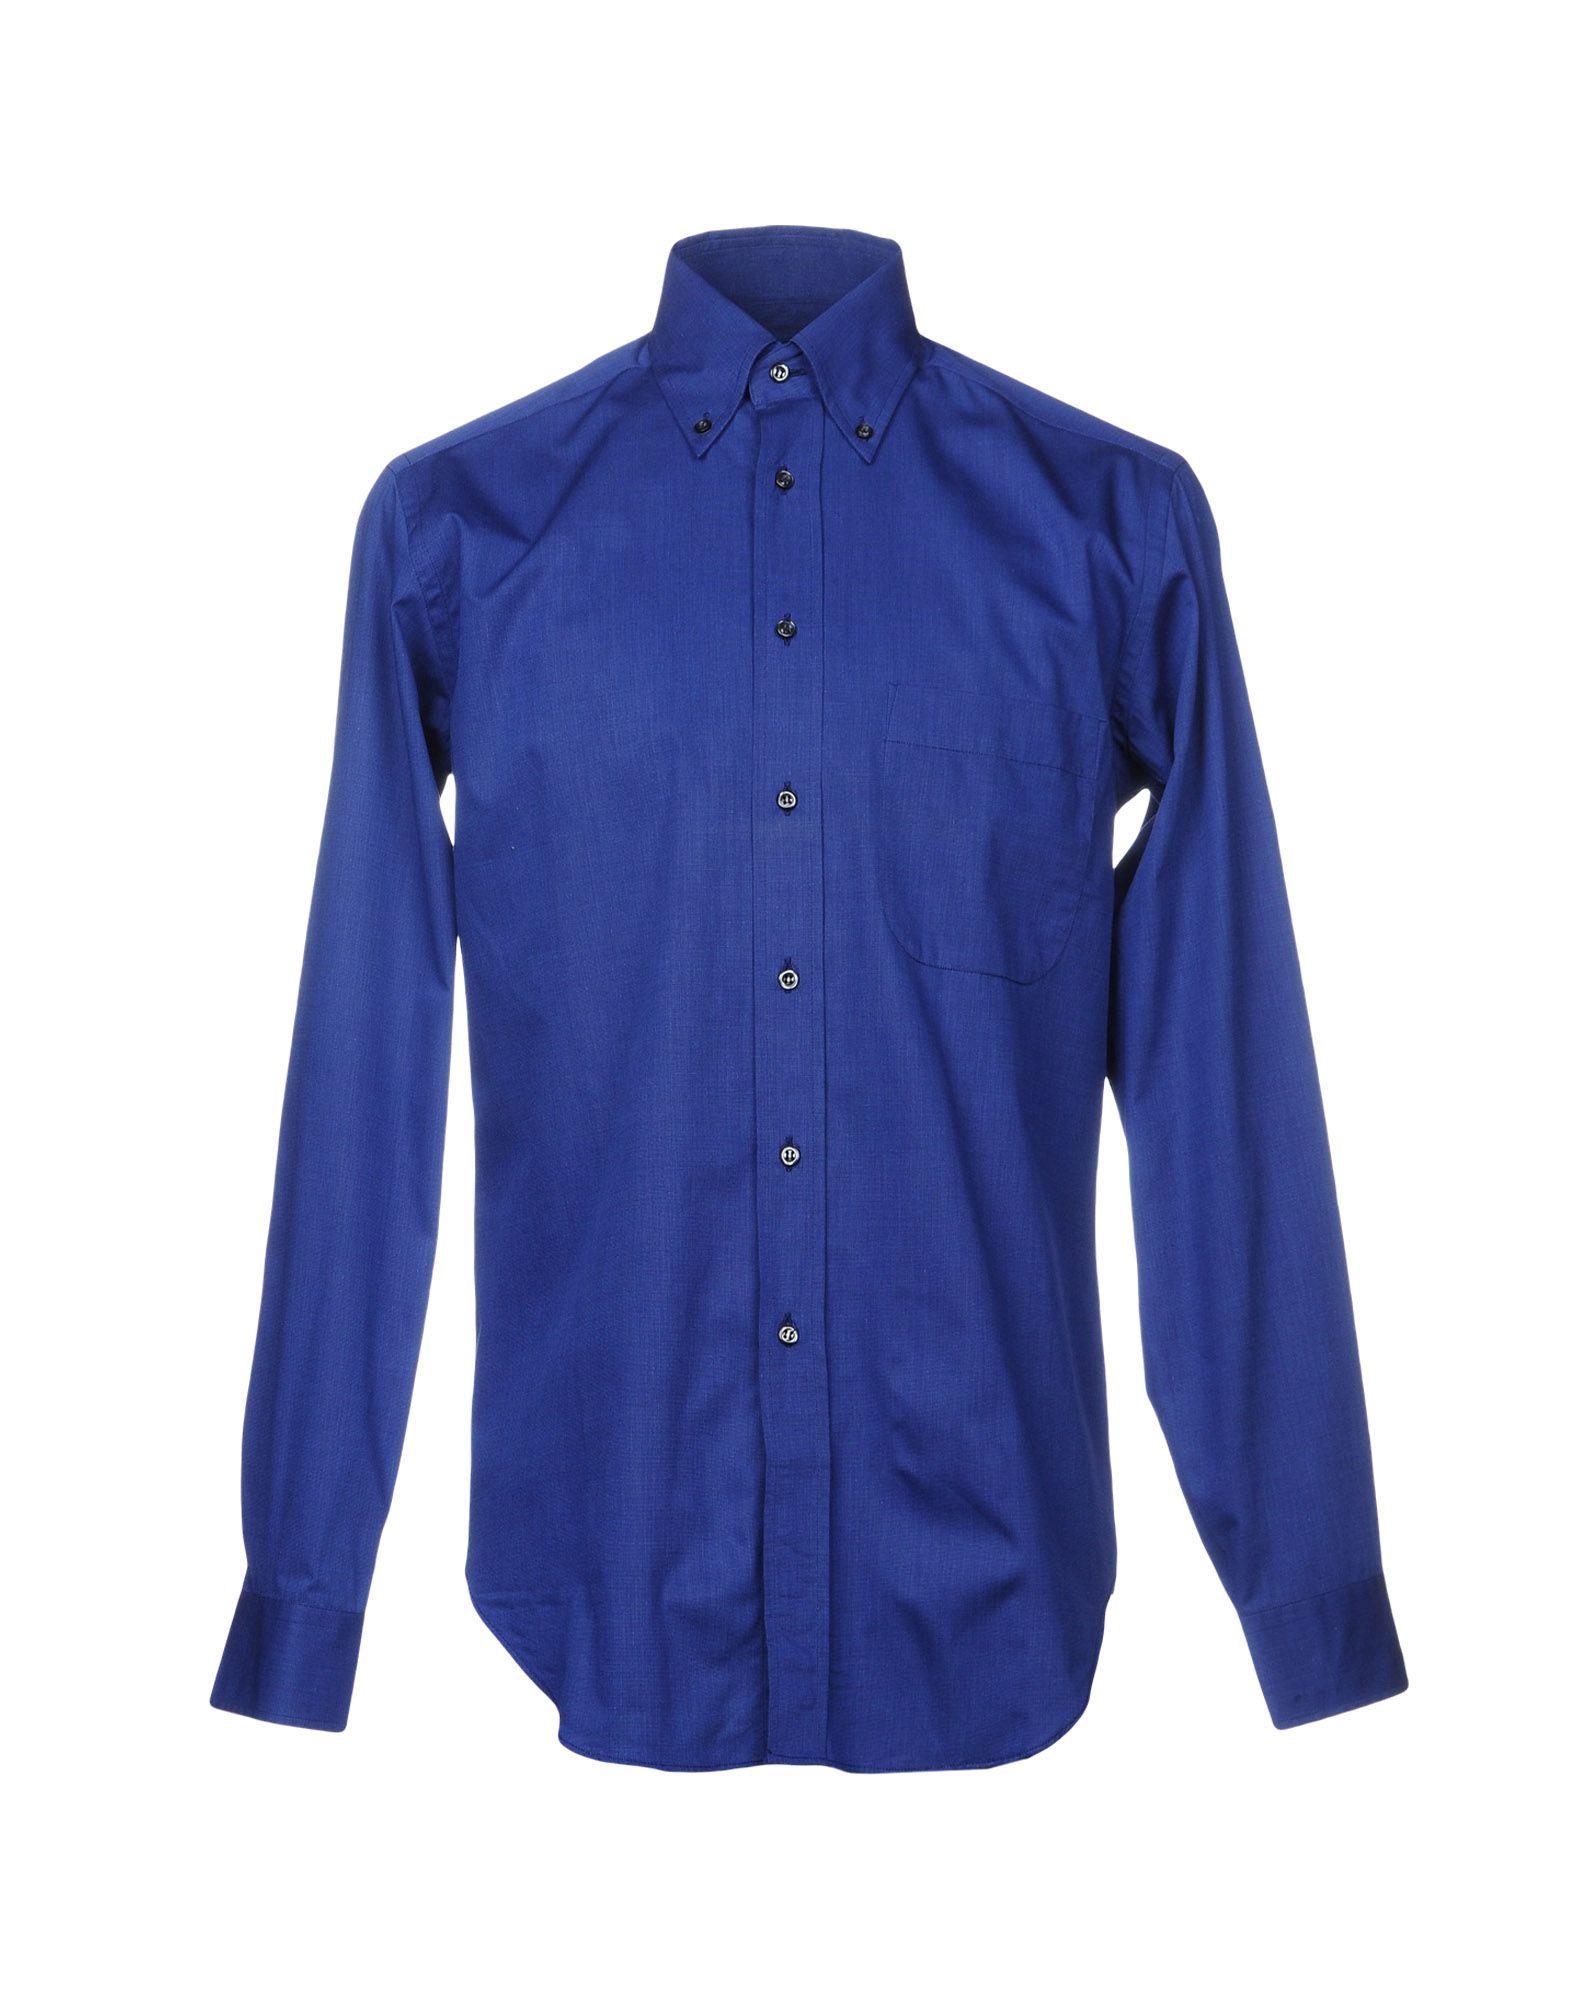 BAGUTTA Herren Hemd Farbe Königsblau Größe 3